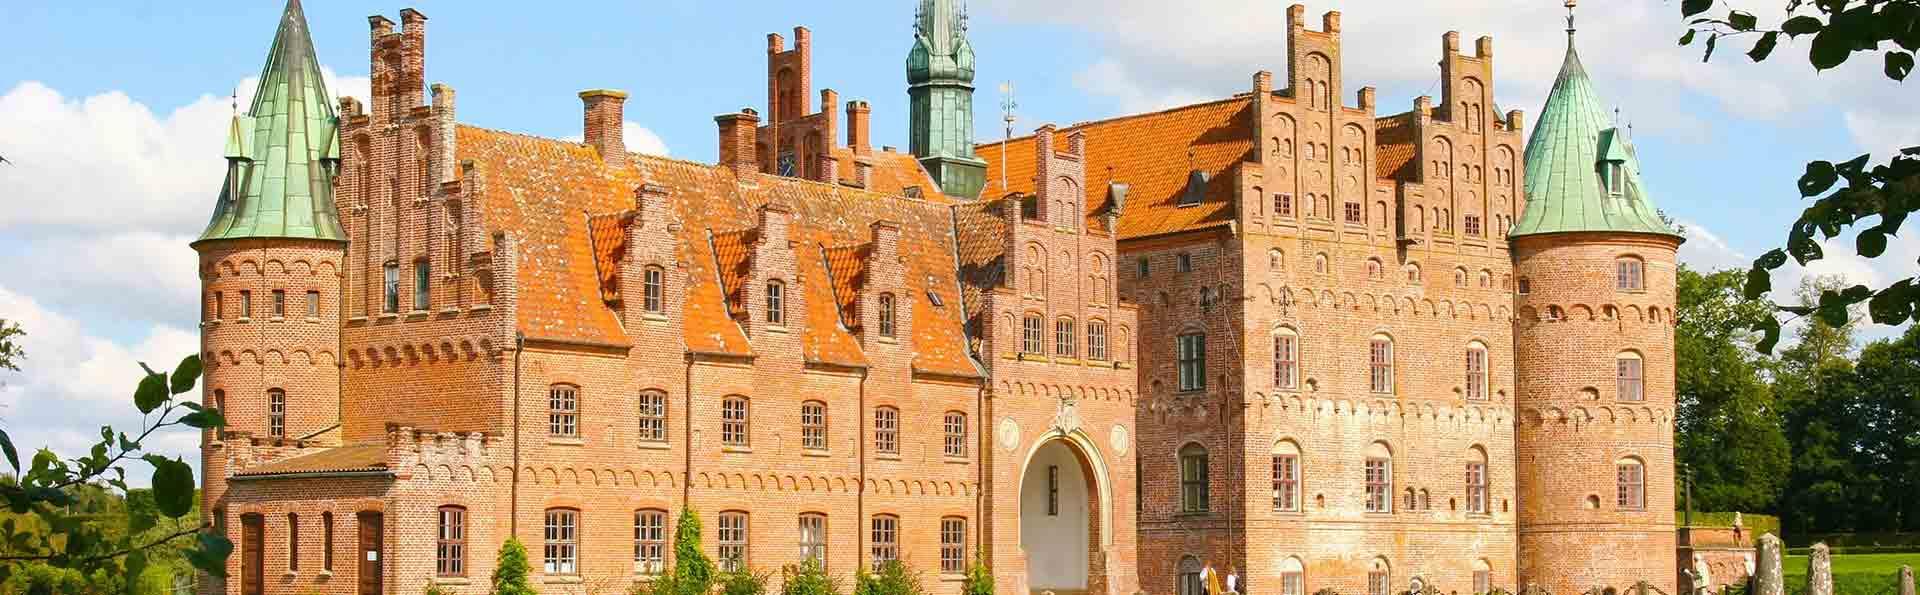 Viaggi ad Odensa - Danimarca